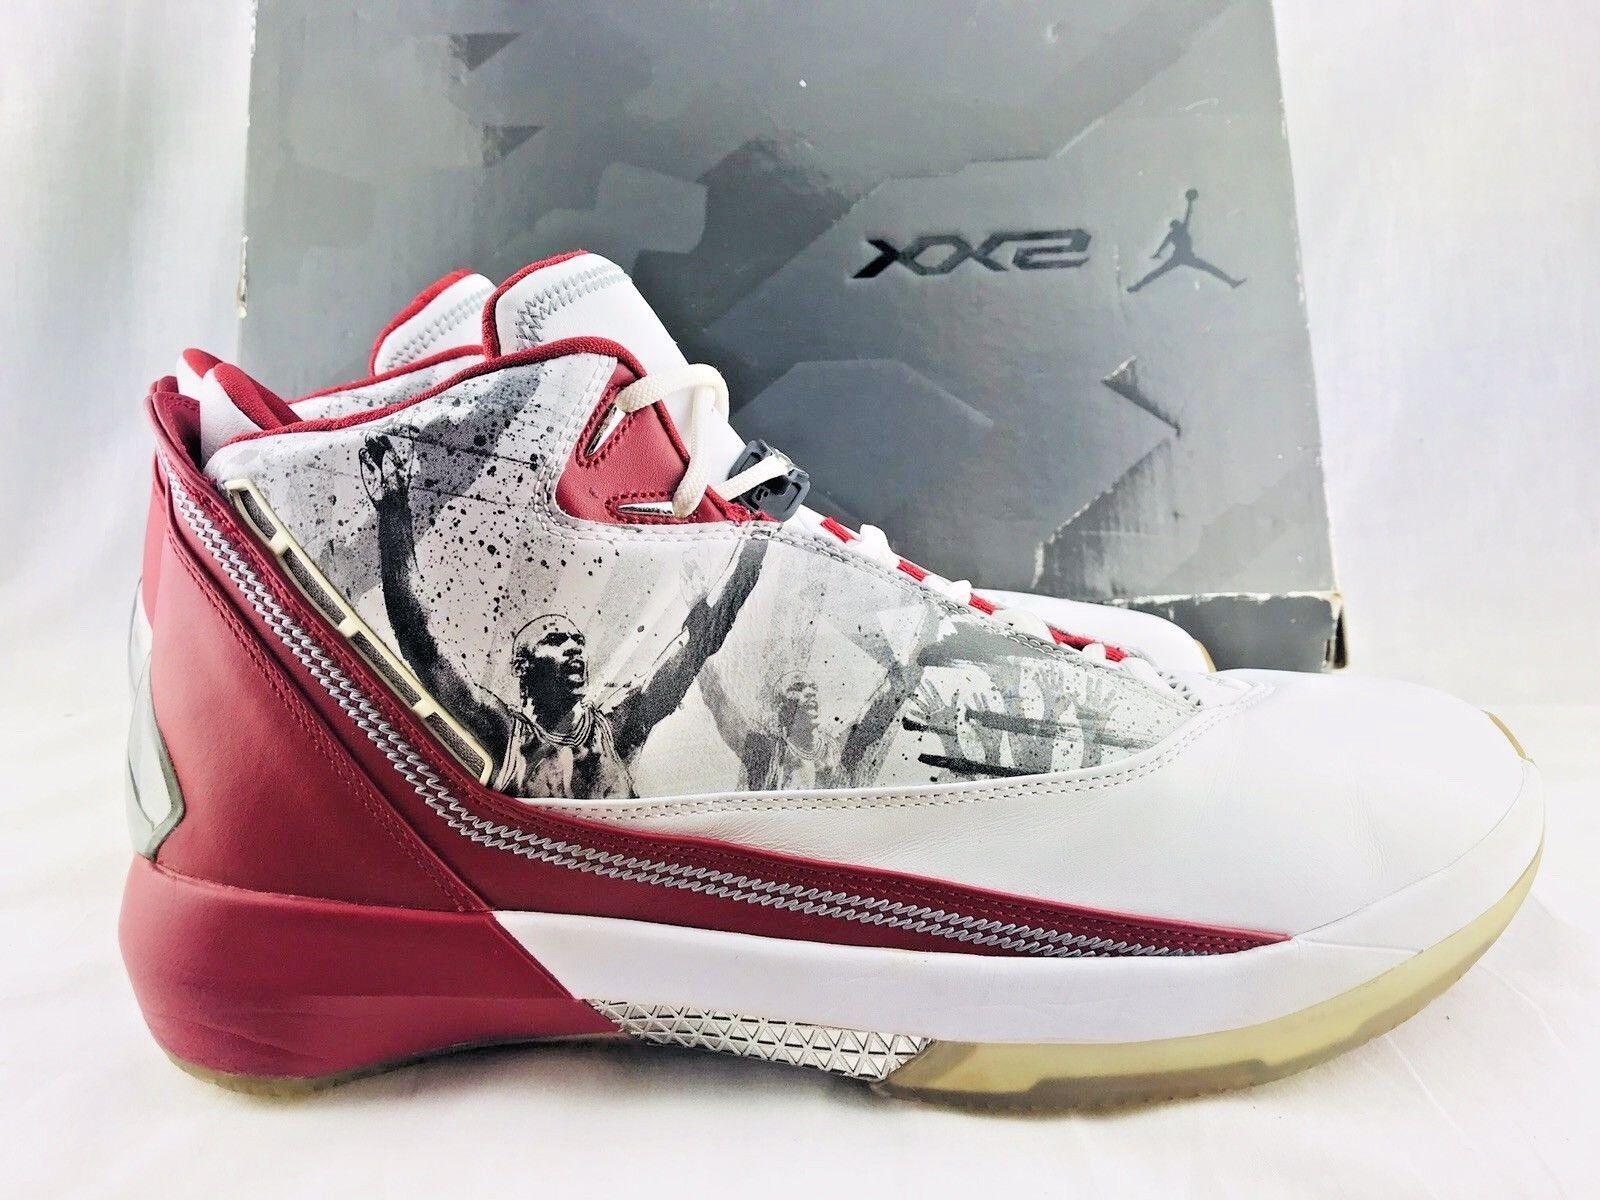 online store f77c9 2115b Nike lebron james soldato xi rosso uomini scarpe da basket ci rosso xi  897644-008 sz 13 474346